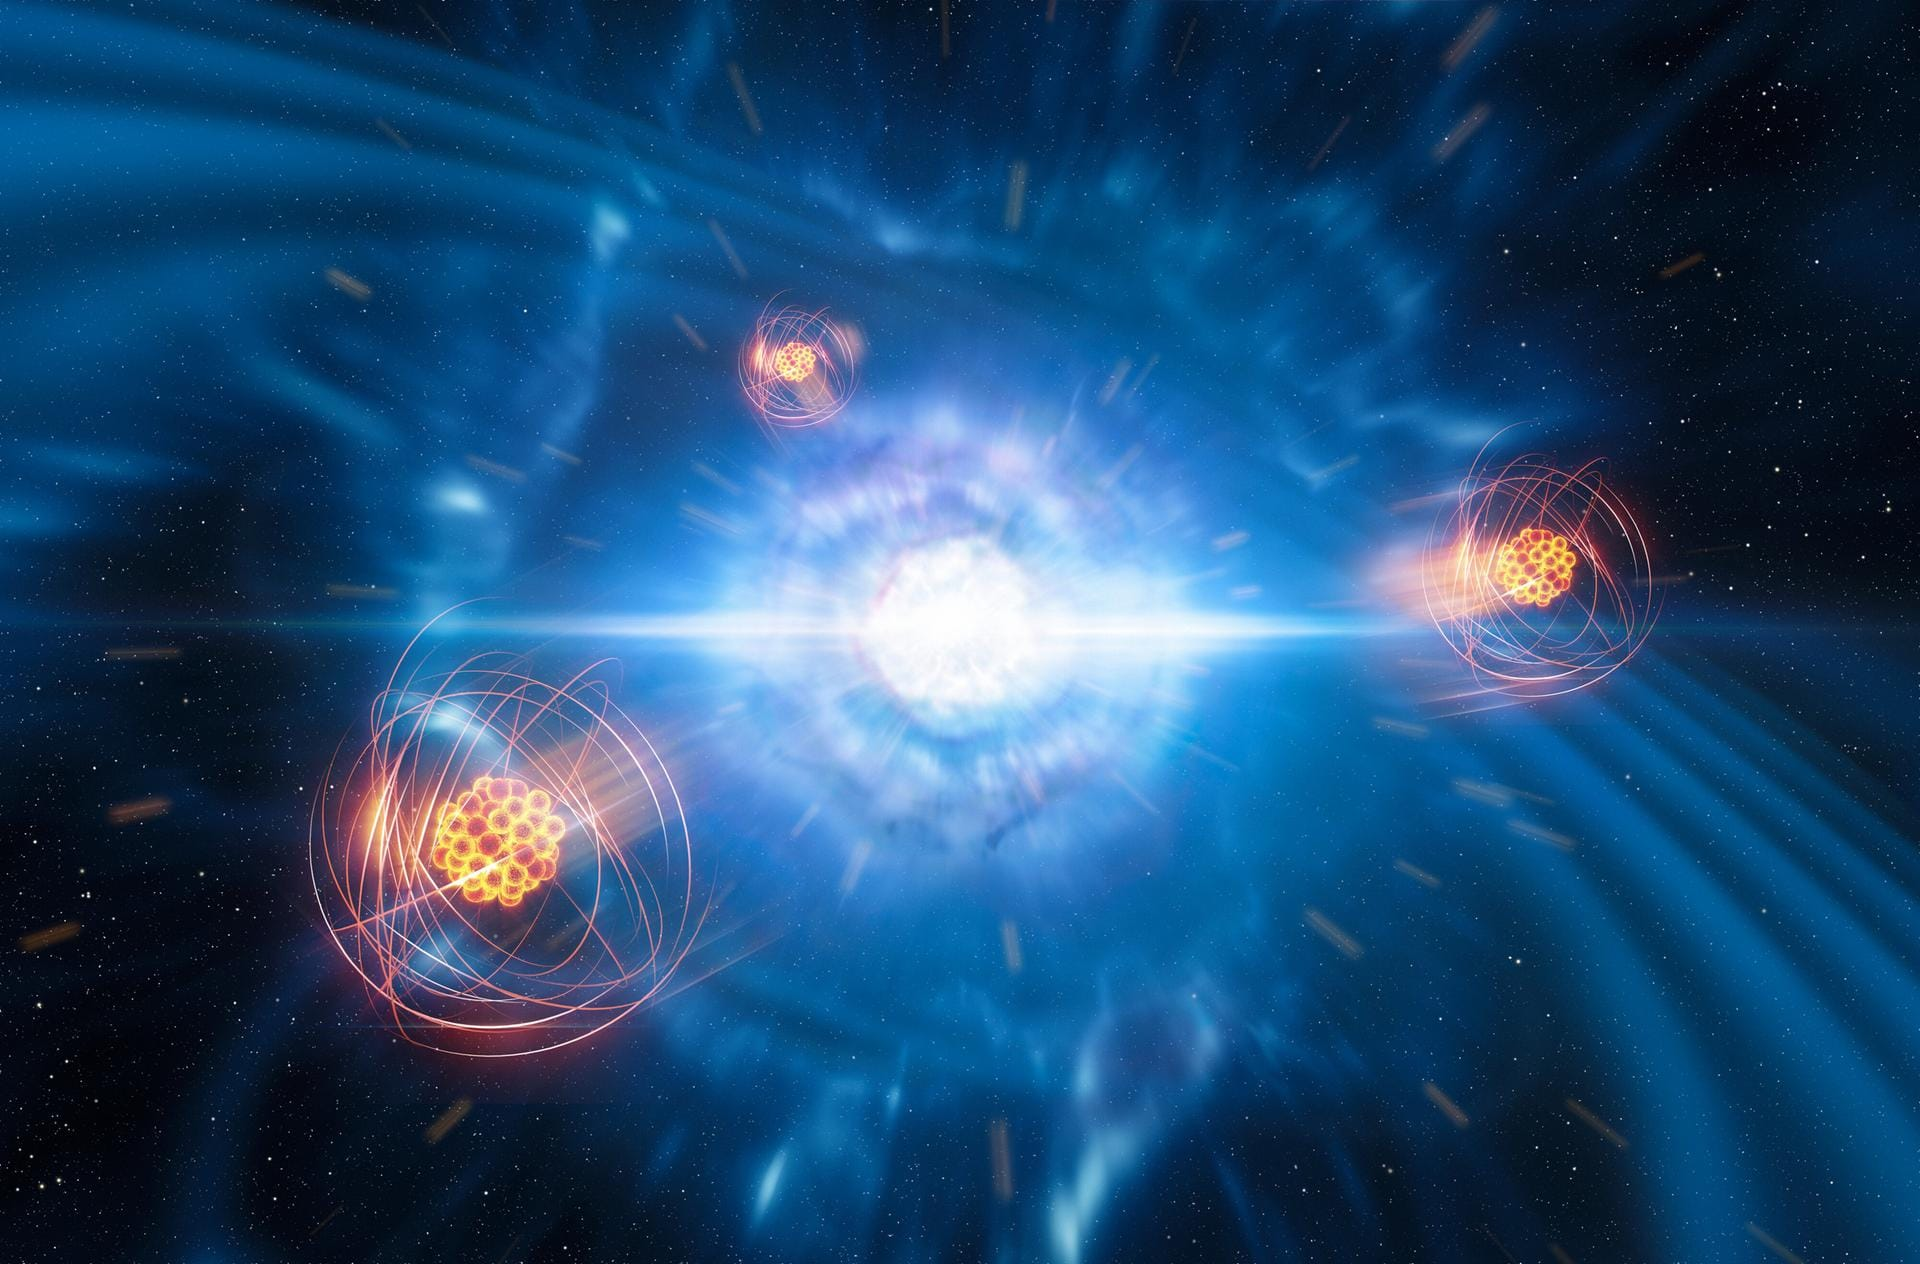 astronomi-vpervie-zaregistrirovali-obrazovanie-stroncia-v-kosmose